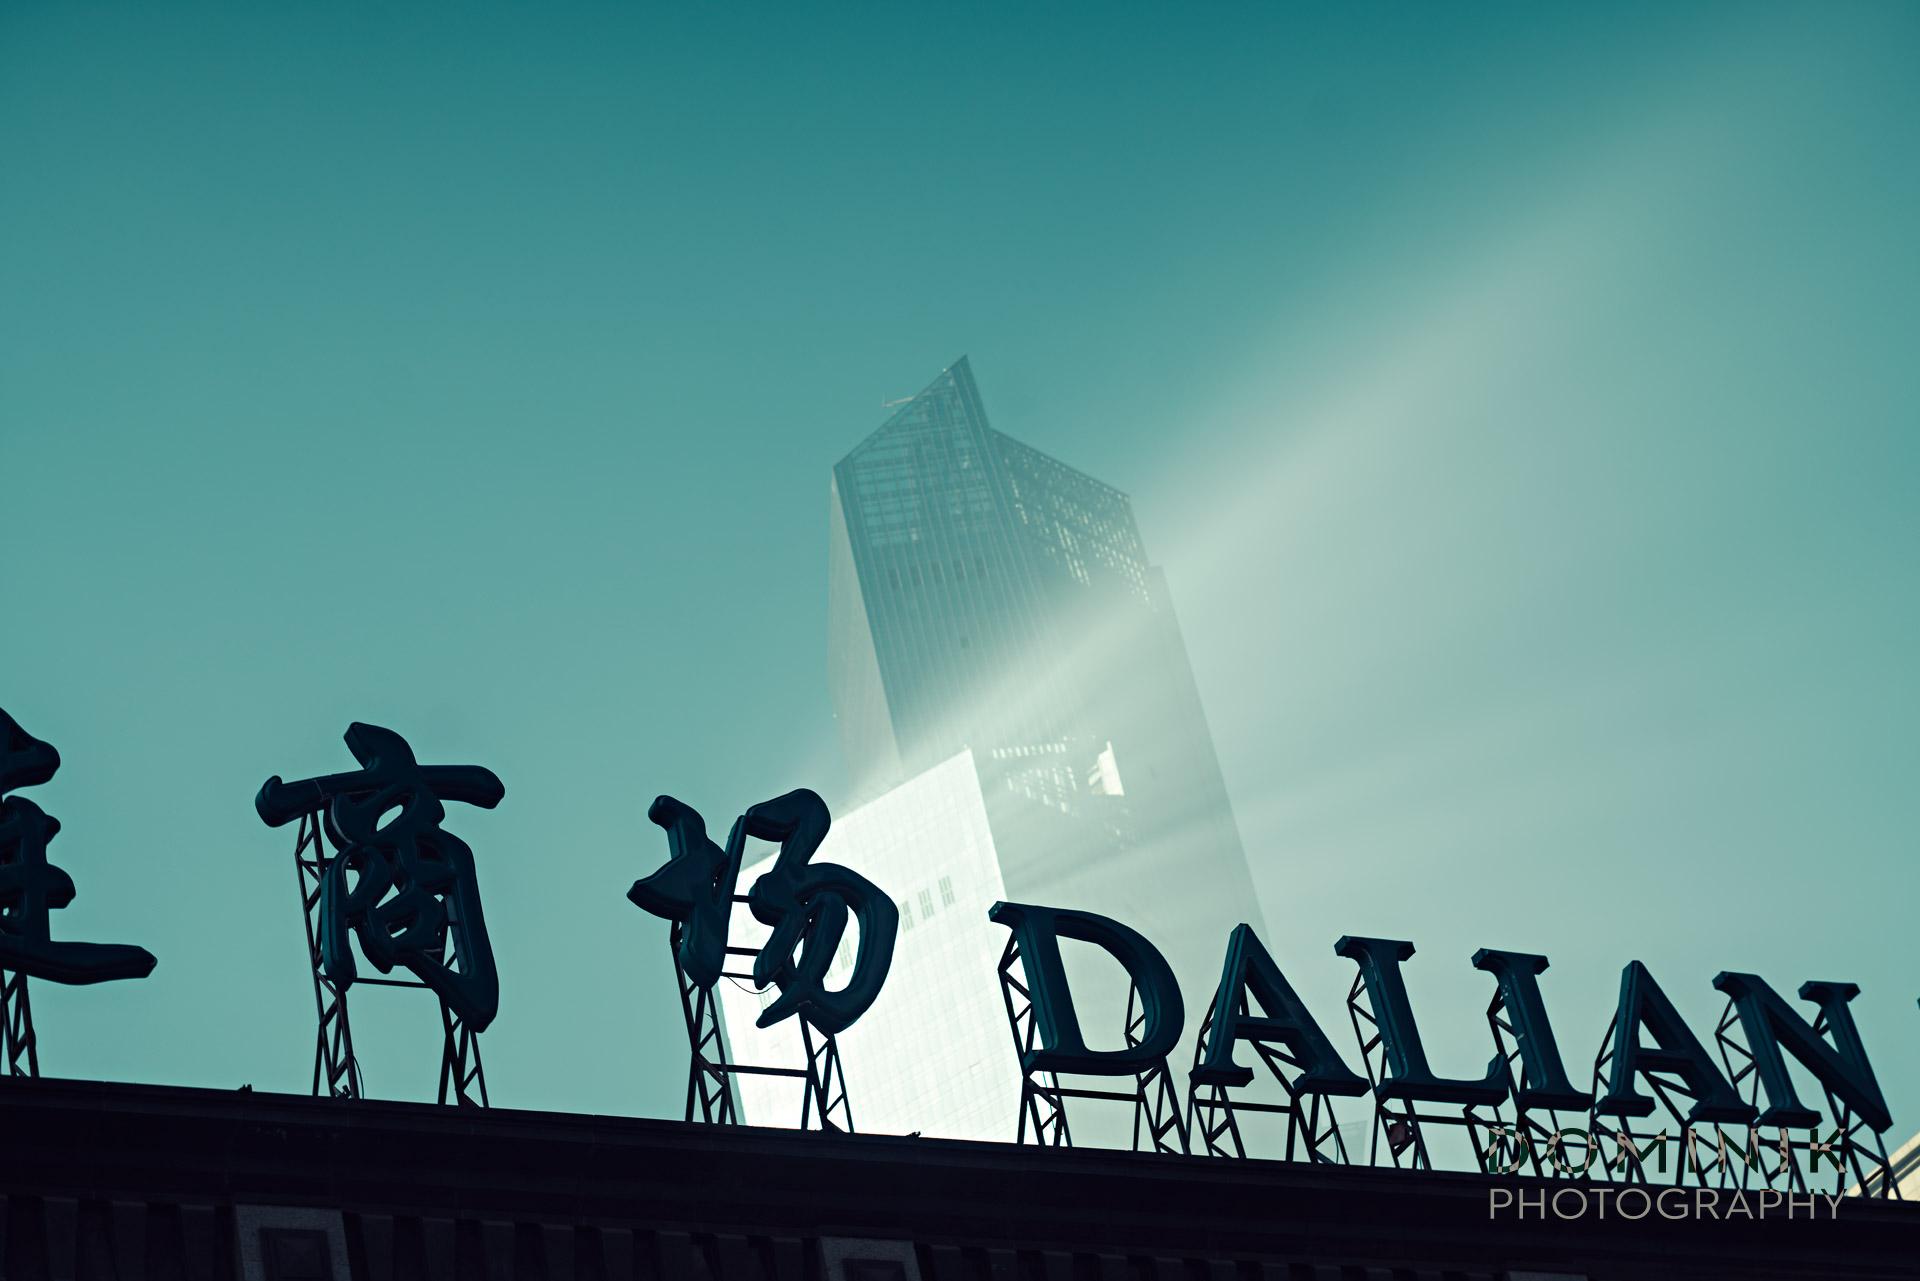 Dalian China by Dominik Photographer